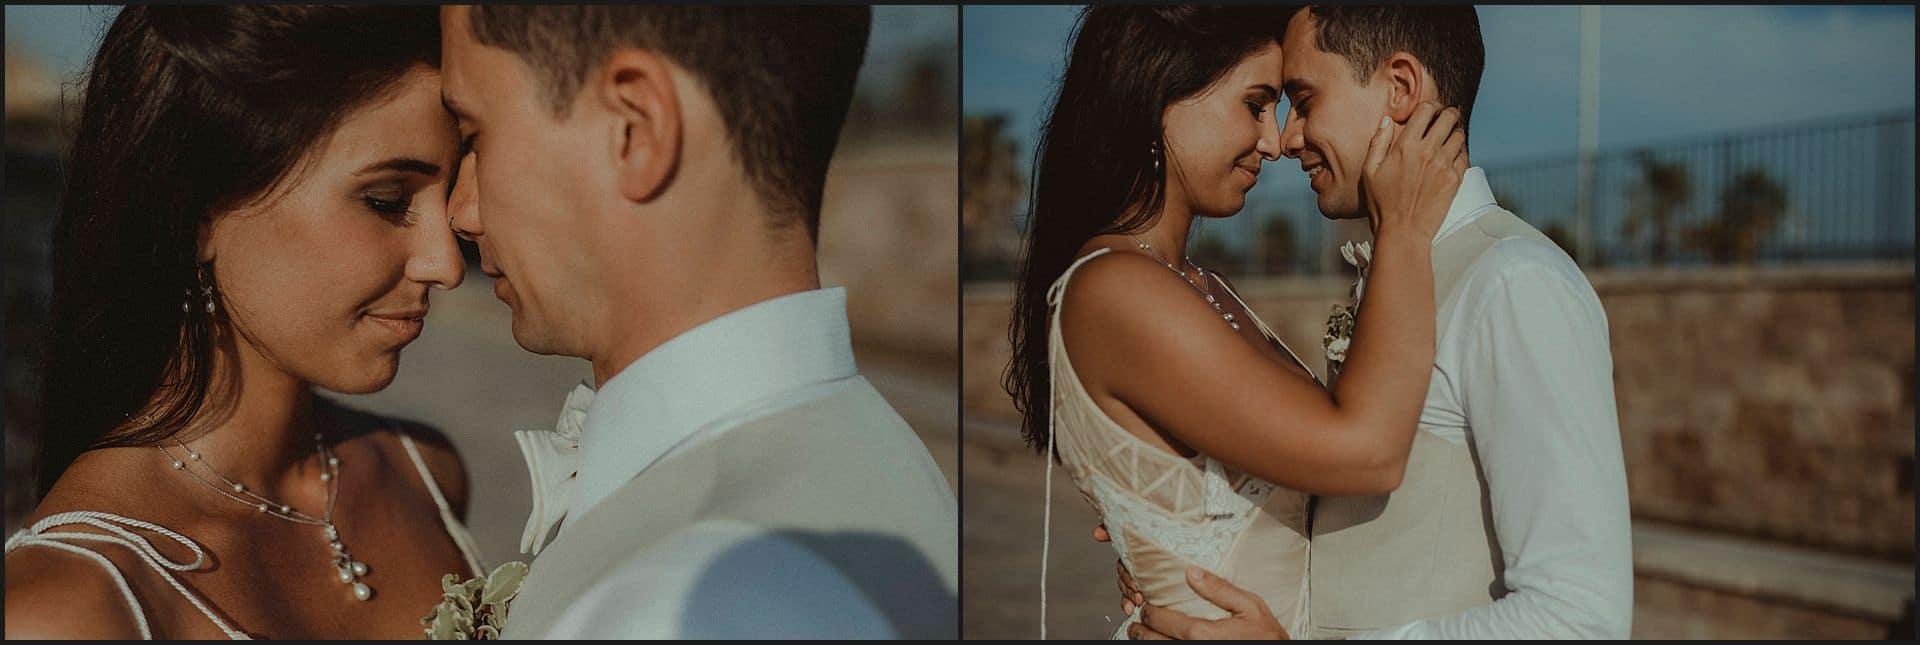 intimate portraits, bride, groom, italy